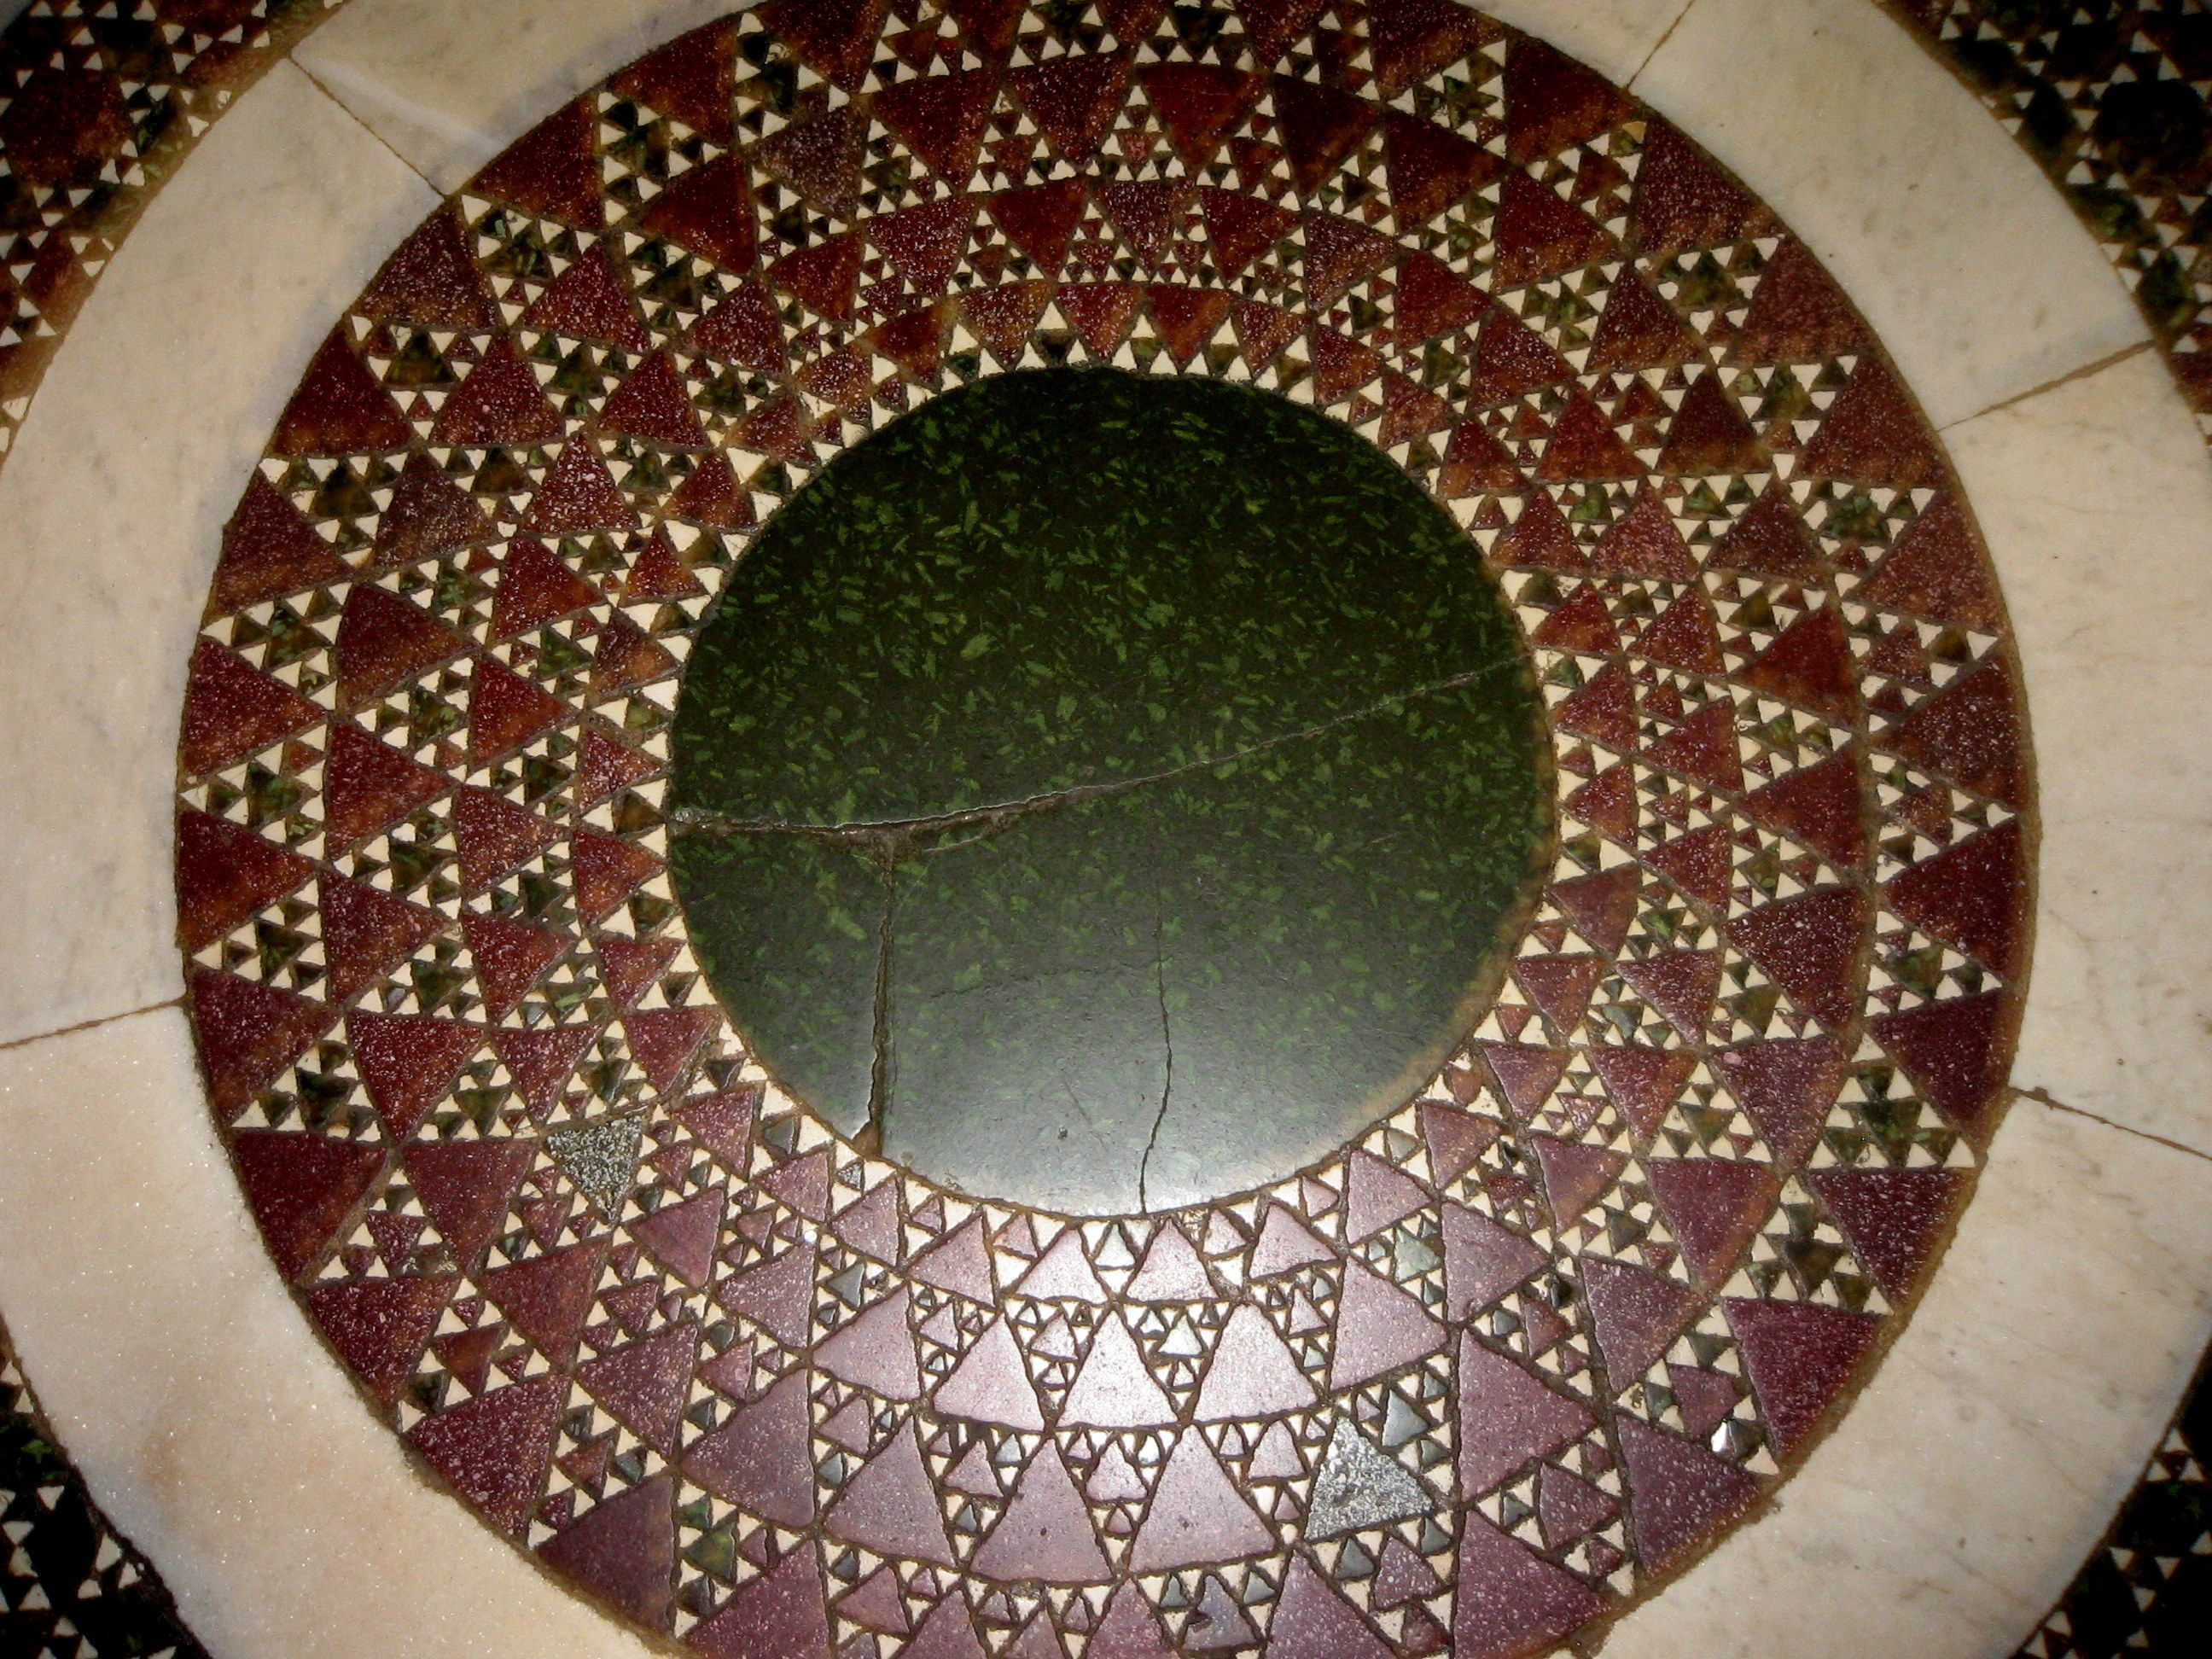 Sierpinski Triangle Fractal Floor, Vatican